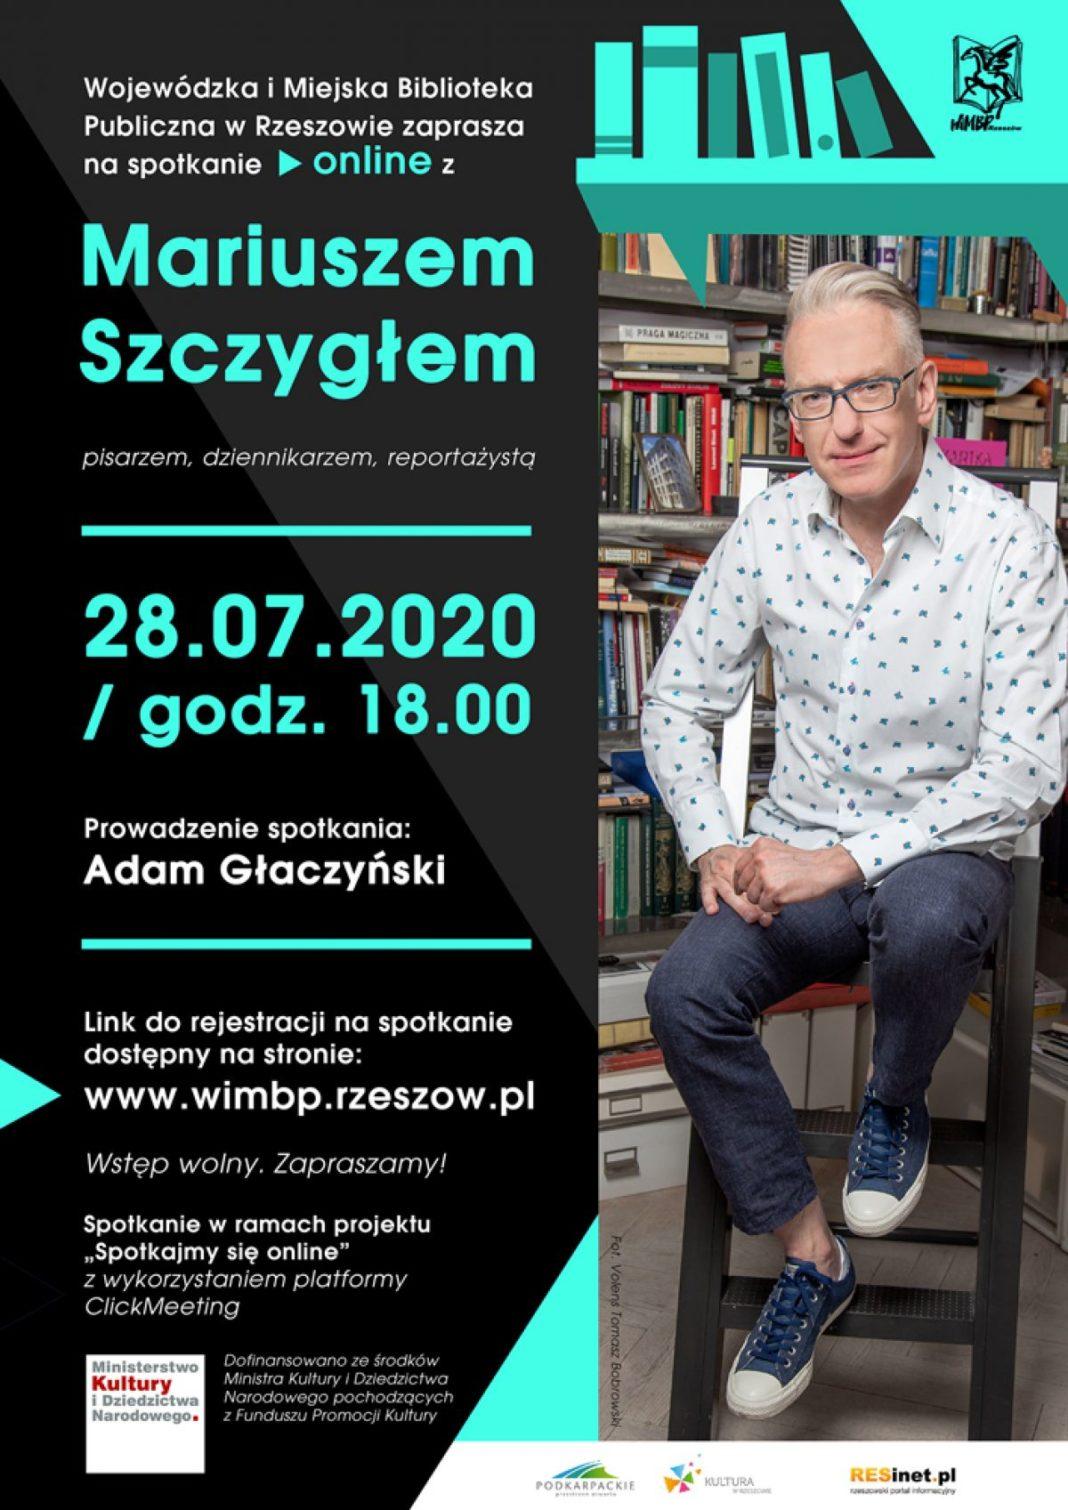 fot. erzeszow.pl